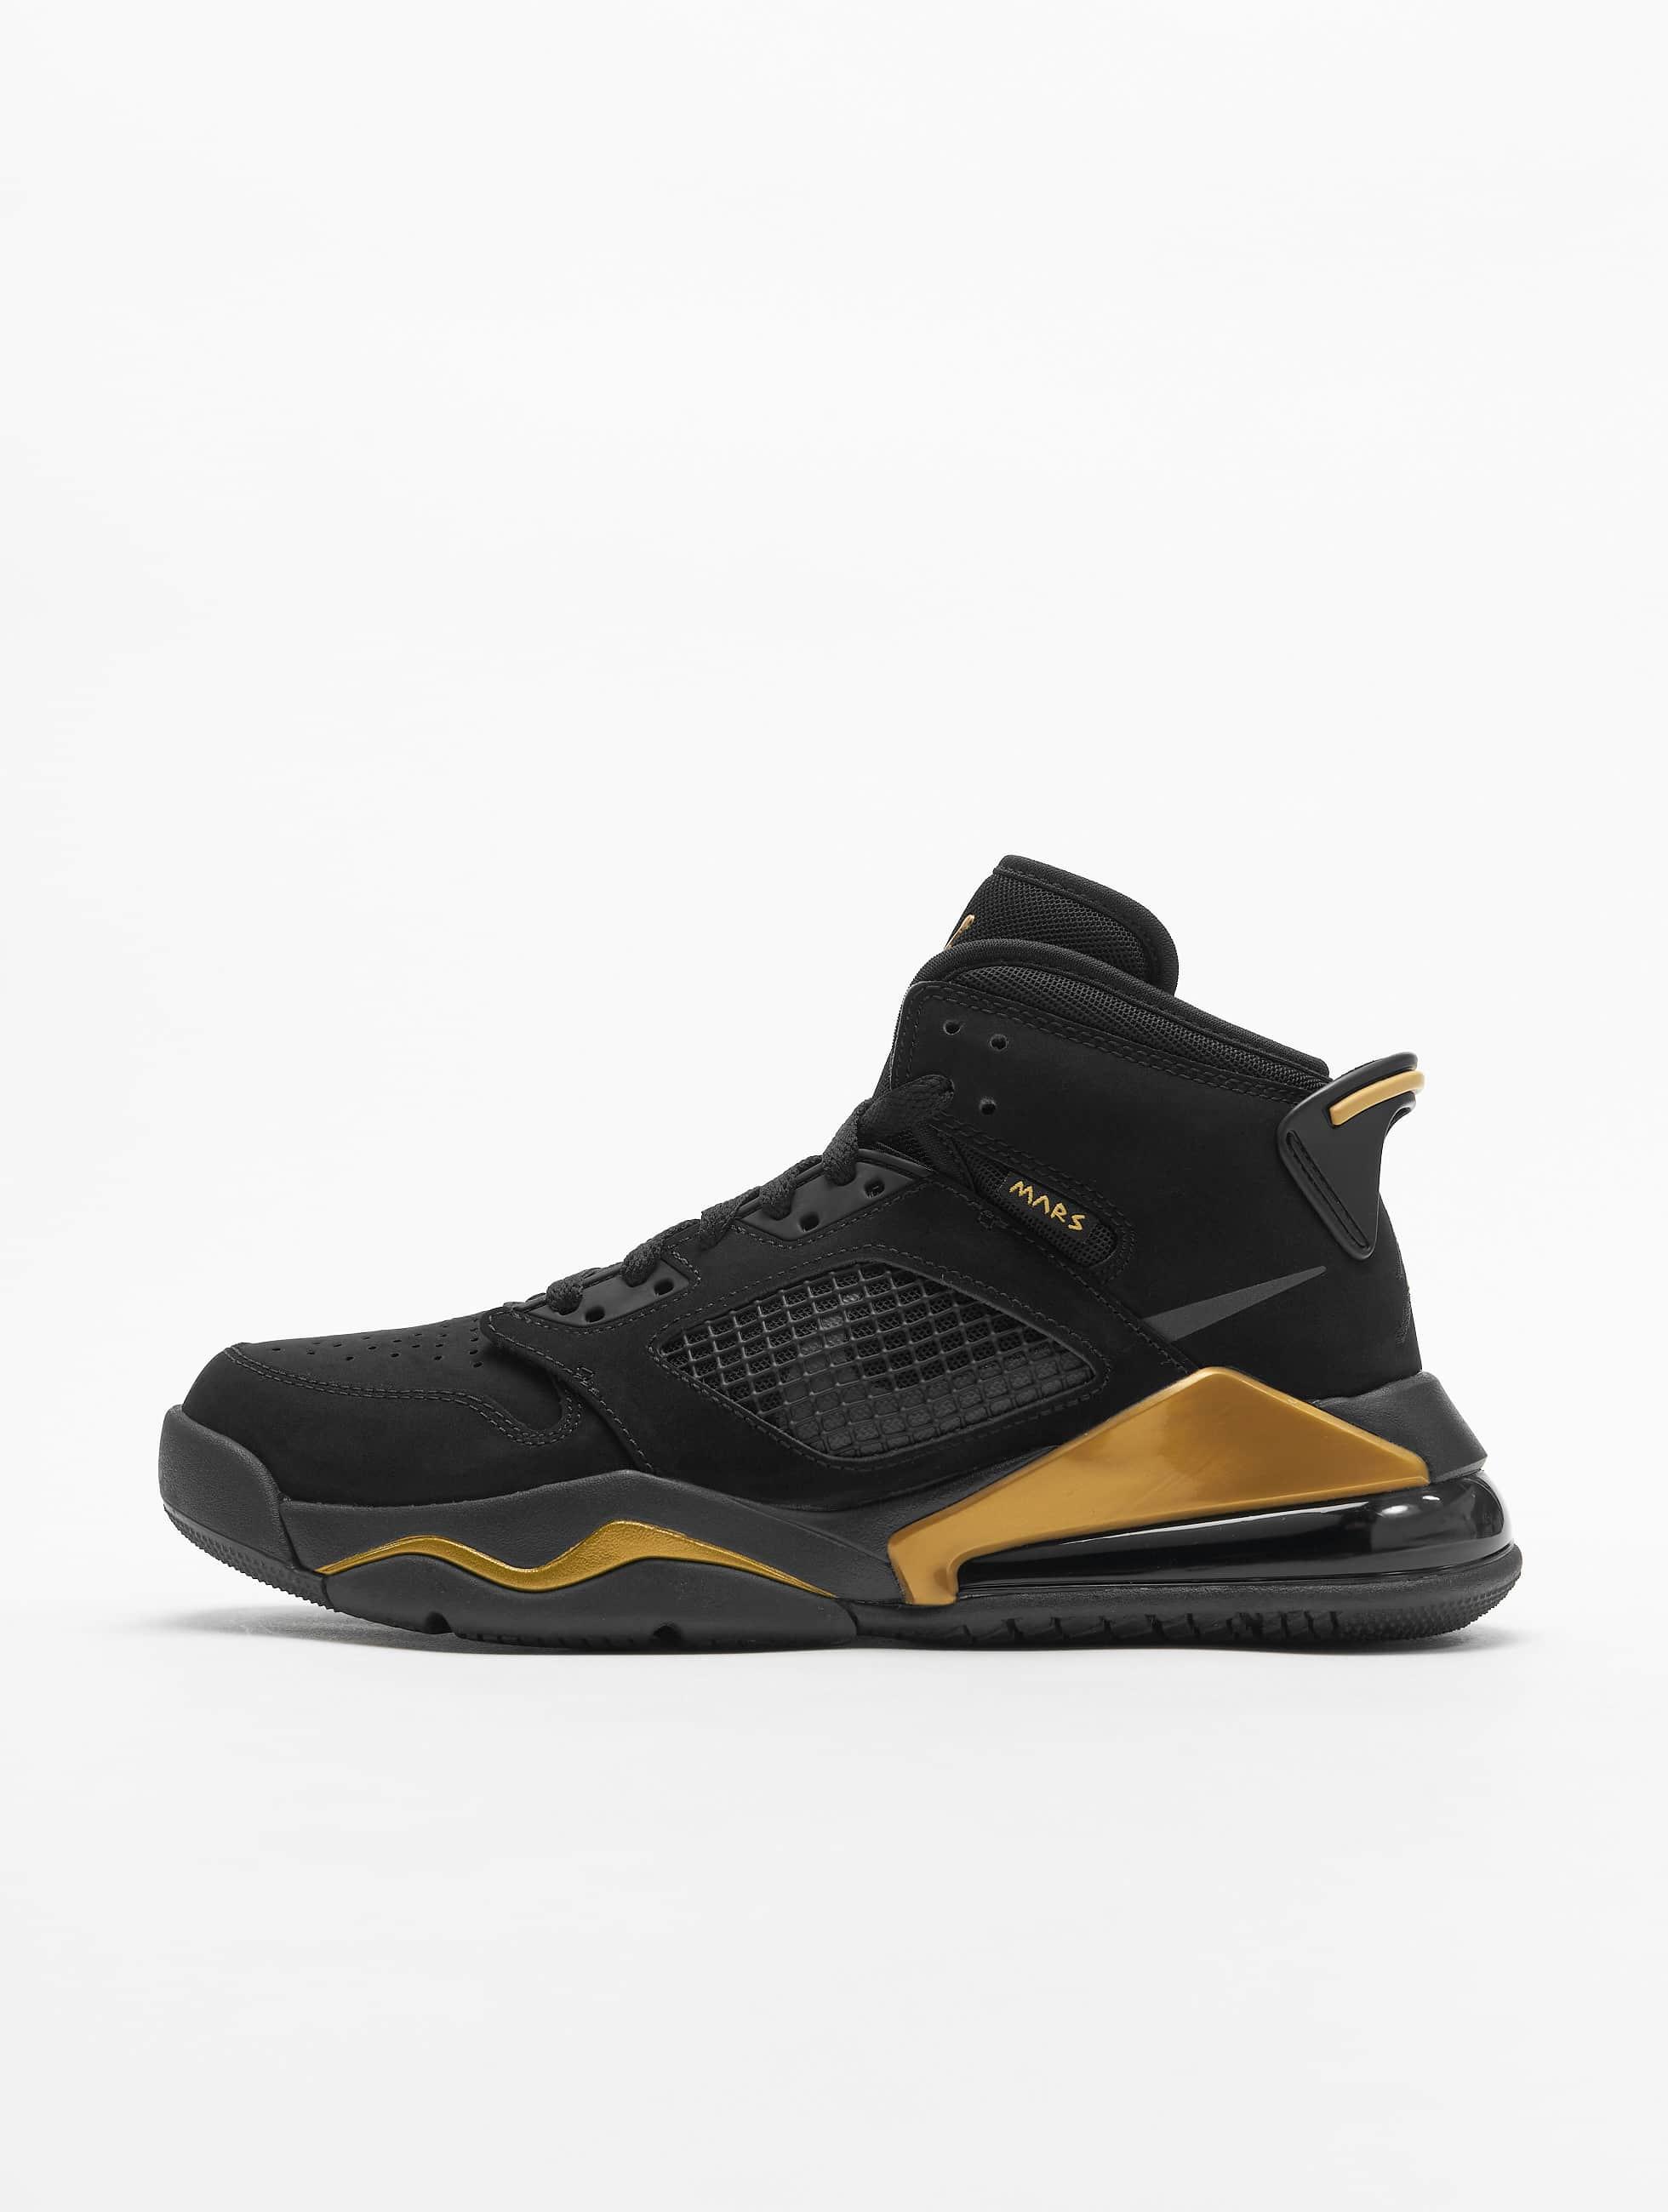 Jordan Mars 270 (GS) Sneakers BlackAnthraciteMetallic GoldenBlack